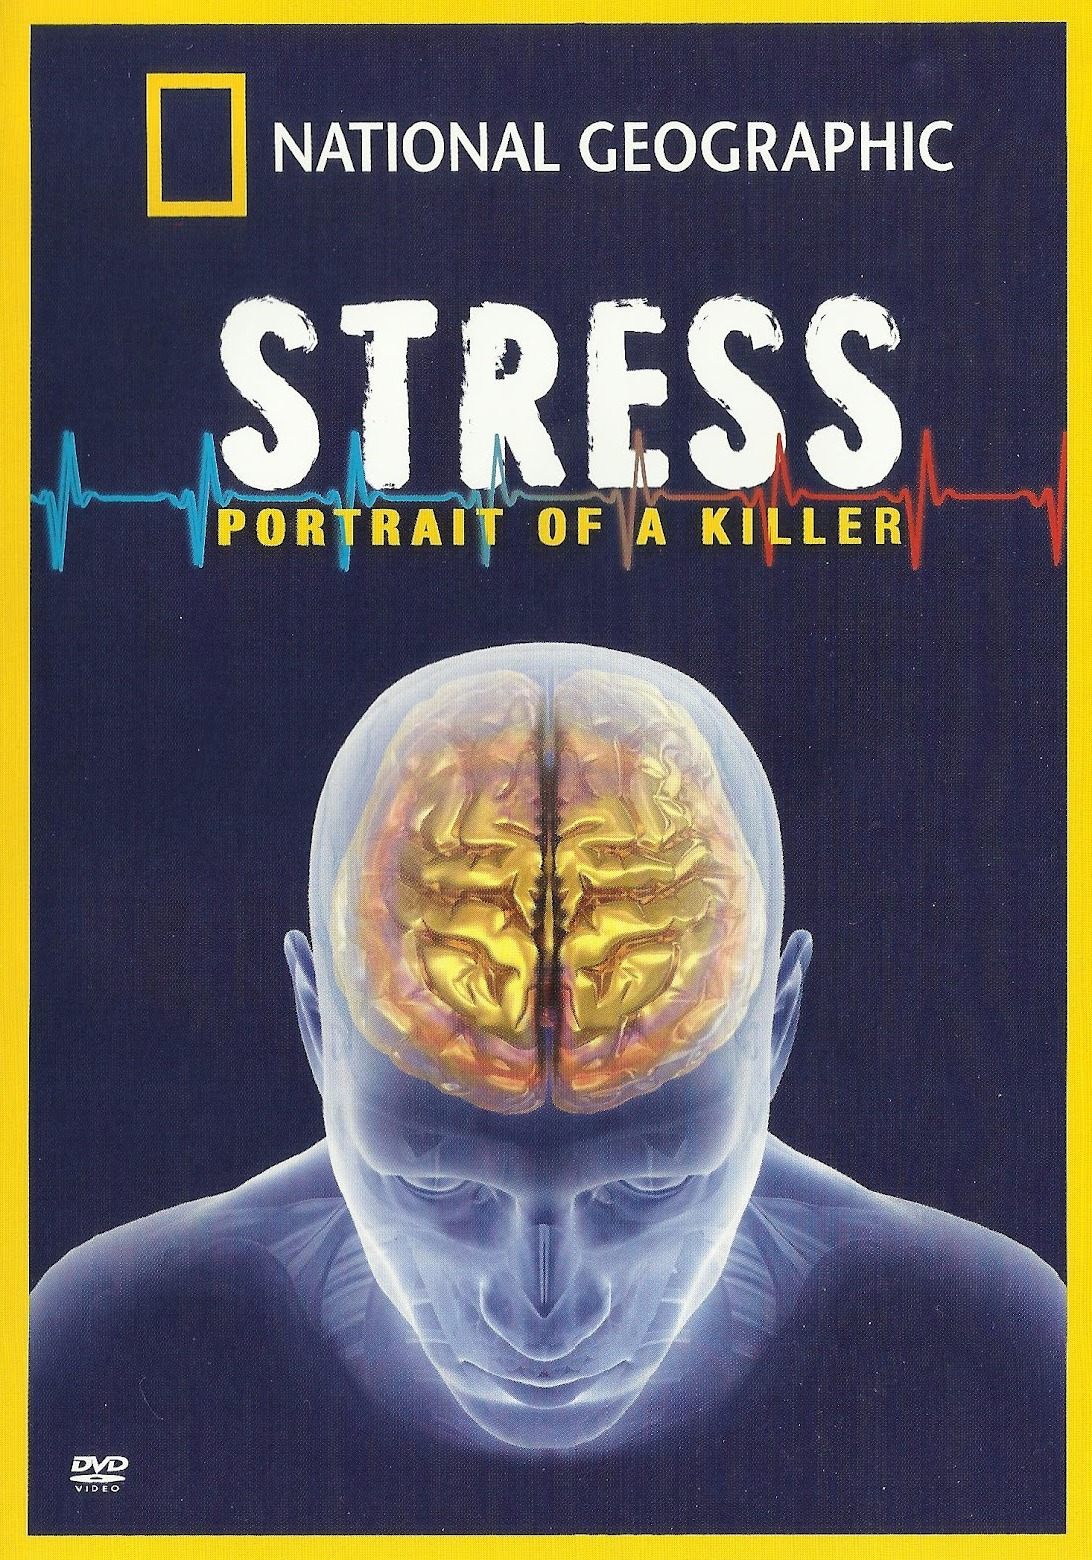 Killer Stress: A National Geographic Special (TV Movie 2008) - IMDb